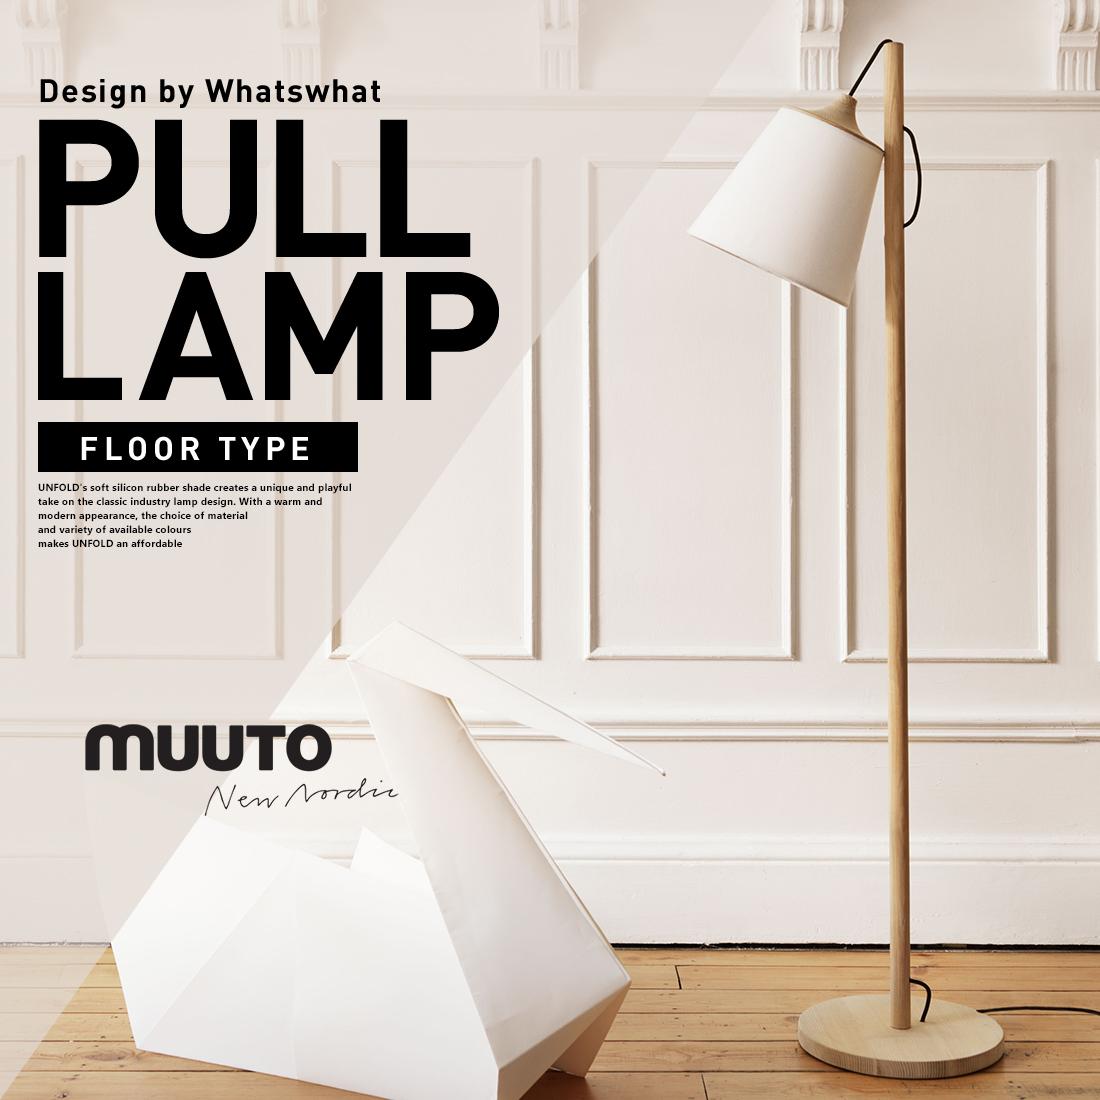 【MUUTO ムート】PULL LAMP プル フロアスタンドスタンドライト フロアランプ ランプシェード 北欧 ●